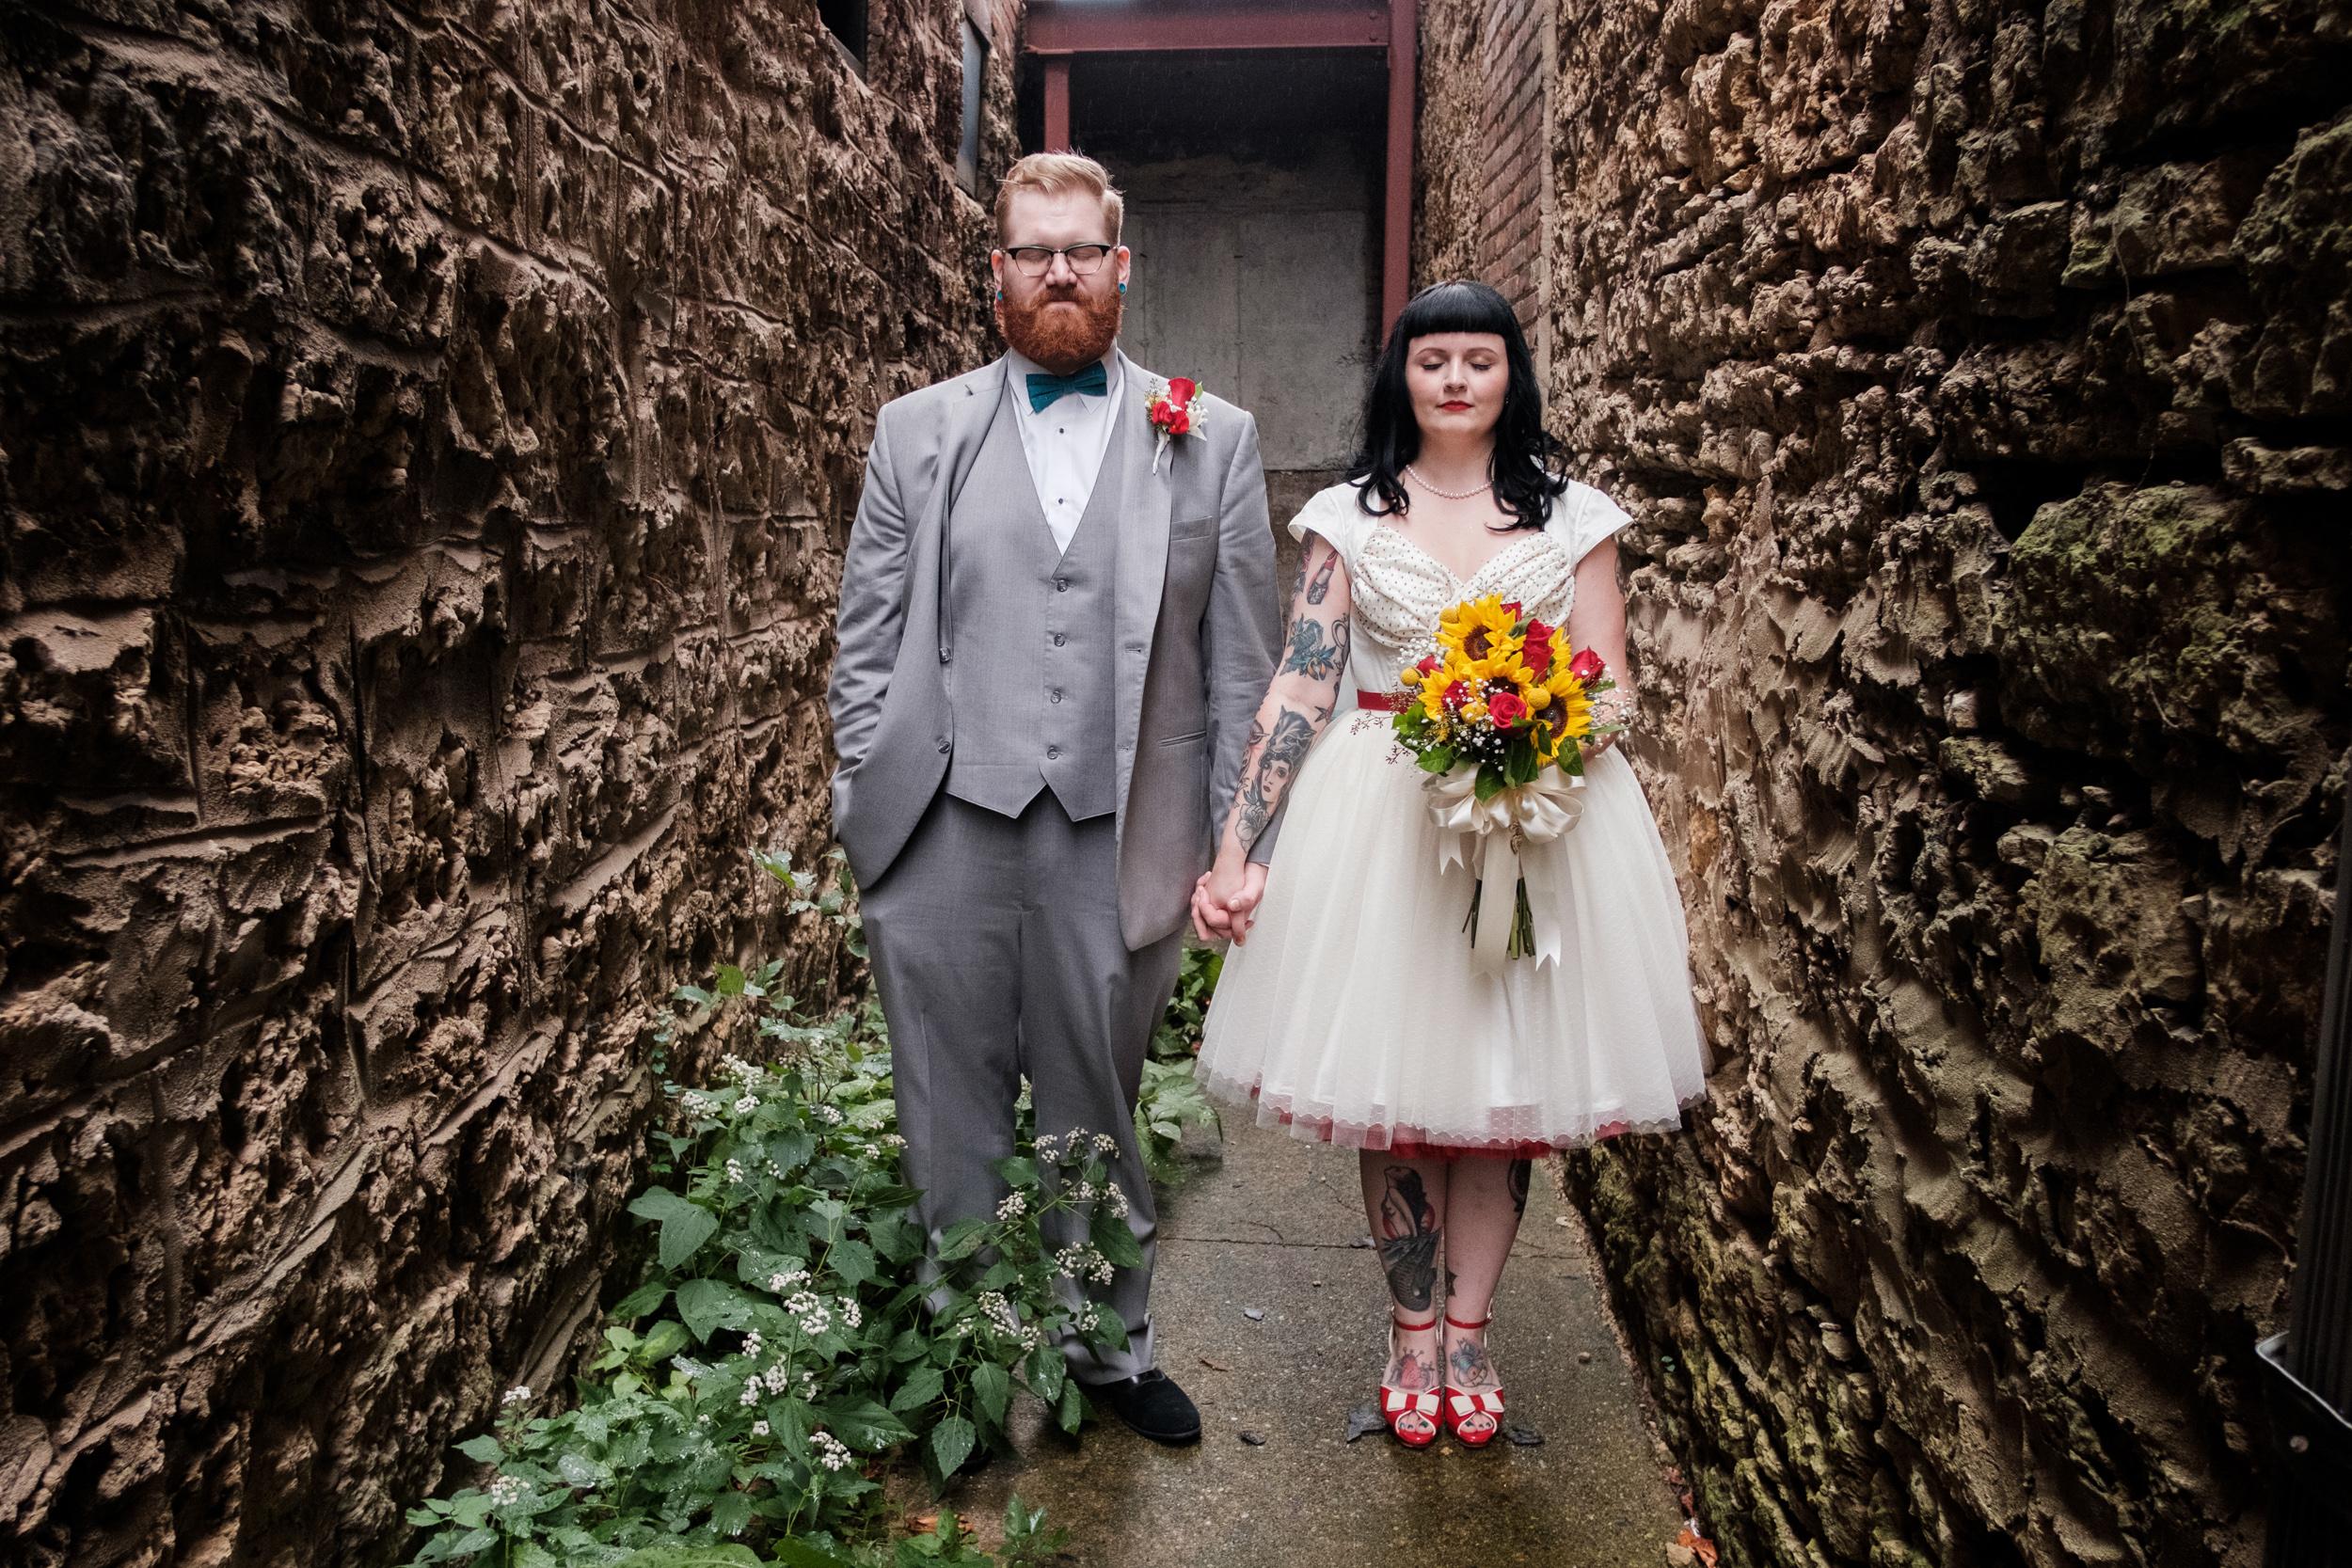 Christian & Sarah wedding photography by Brian milo-199.jpg